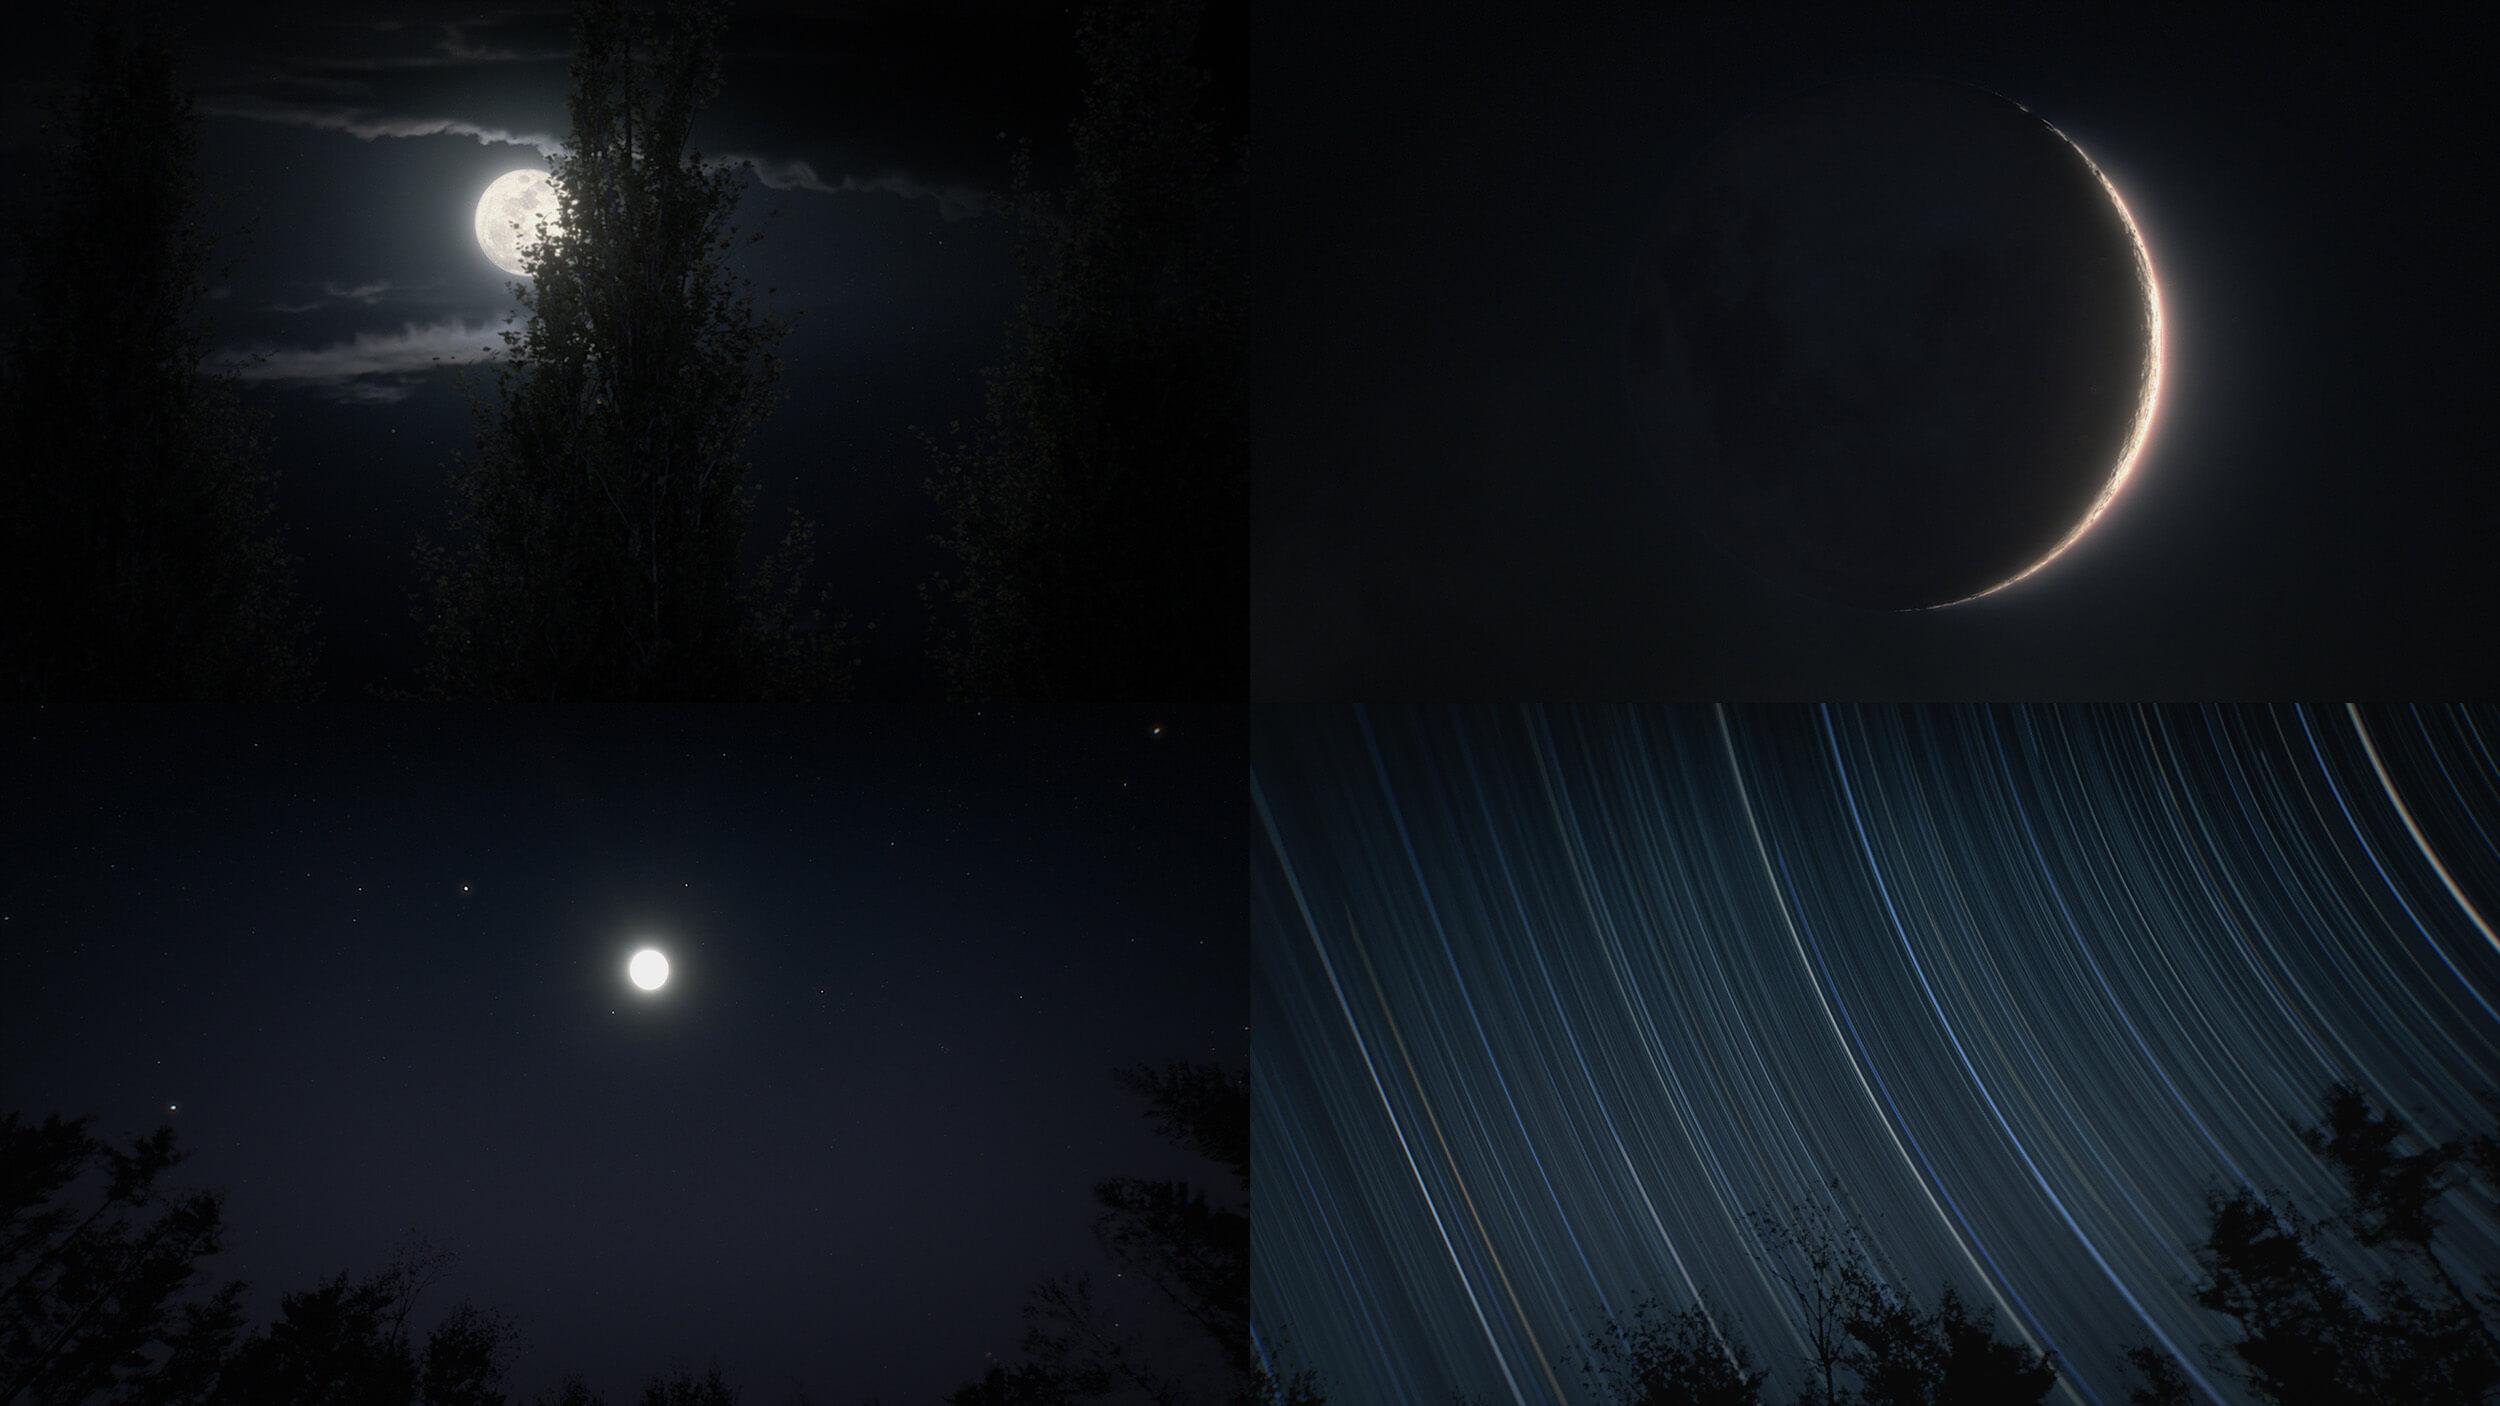 lunar-001_20170711185344.jpg